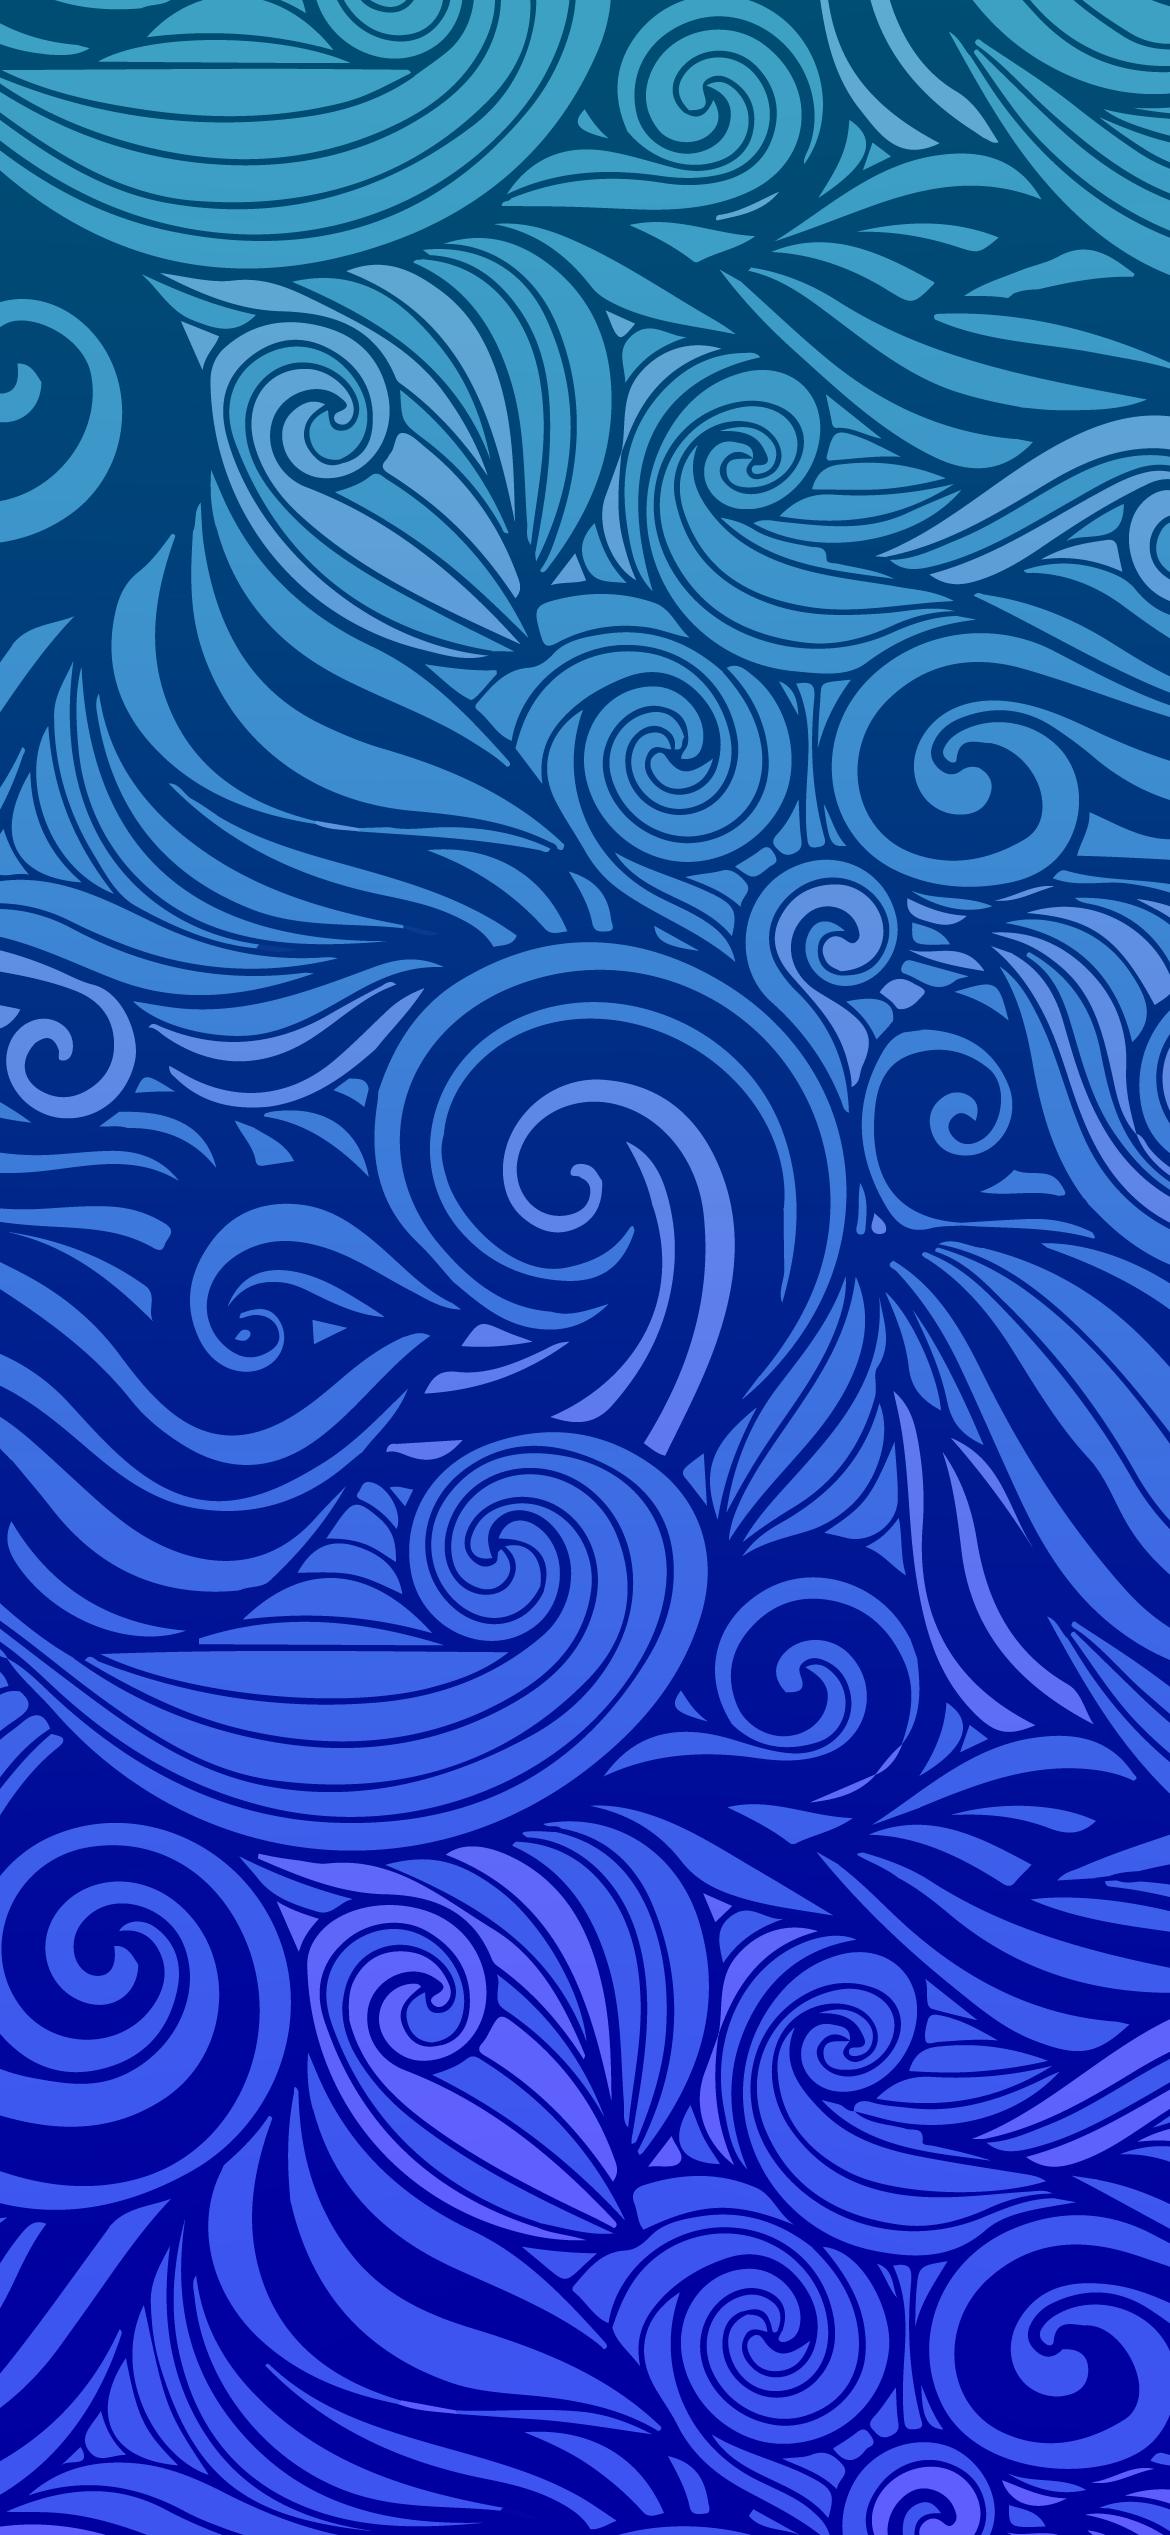 uncompressed blue backfground wallpaper for phone 4k